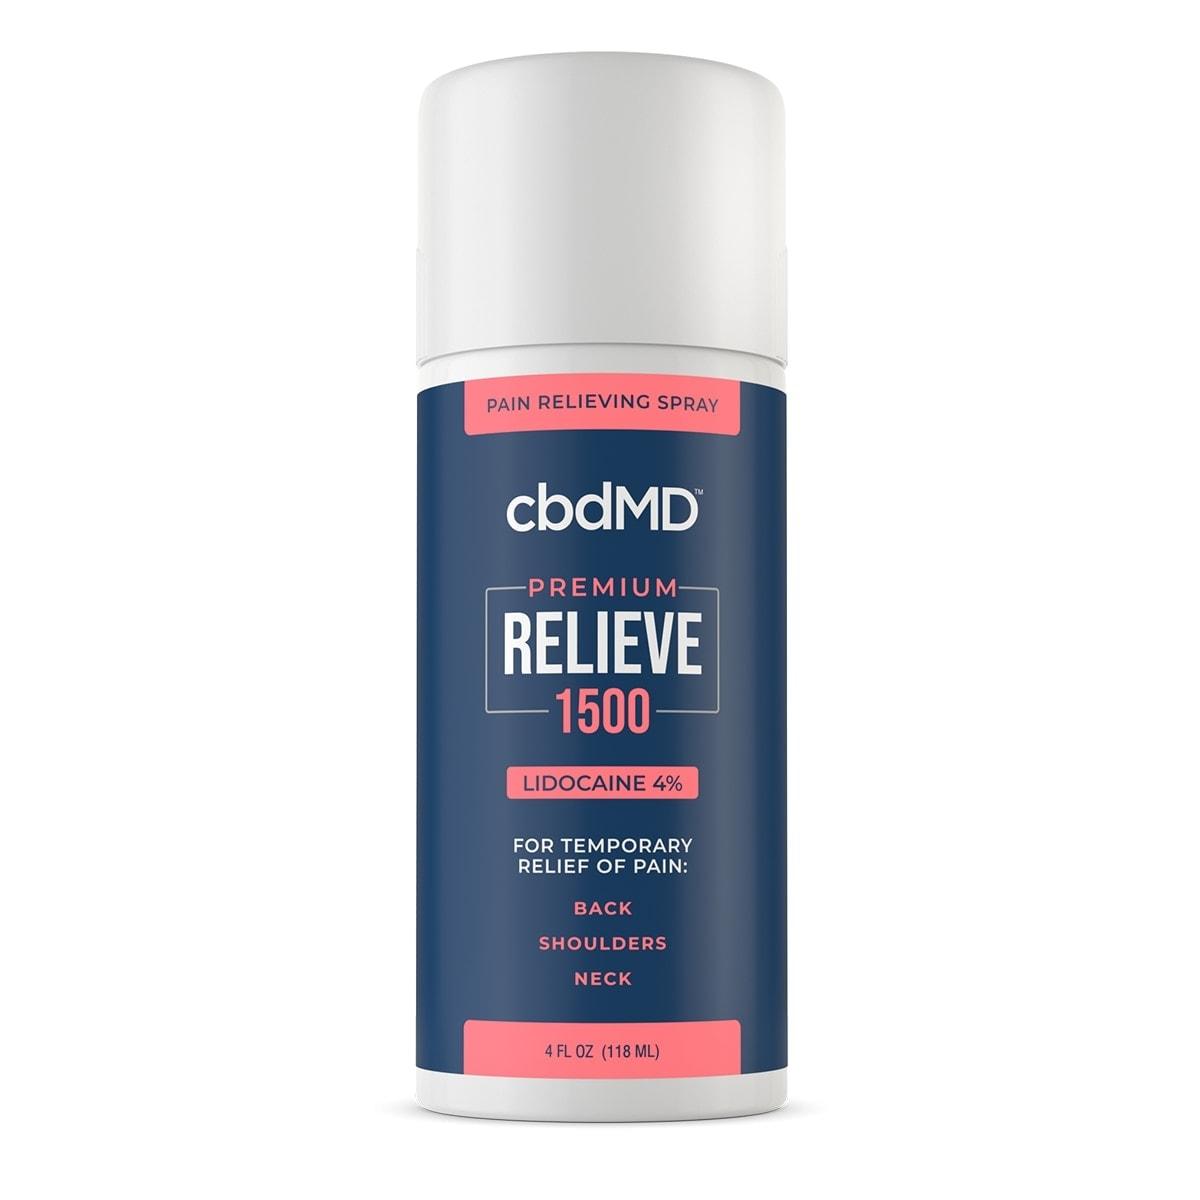 cbdMD, CBD Lidocaine Spray, Broad Spectrum THC-Free, 4oz, 1500mg of CBD2